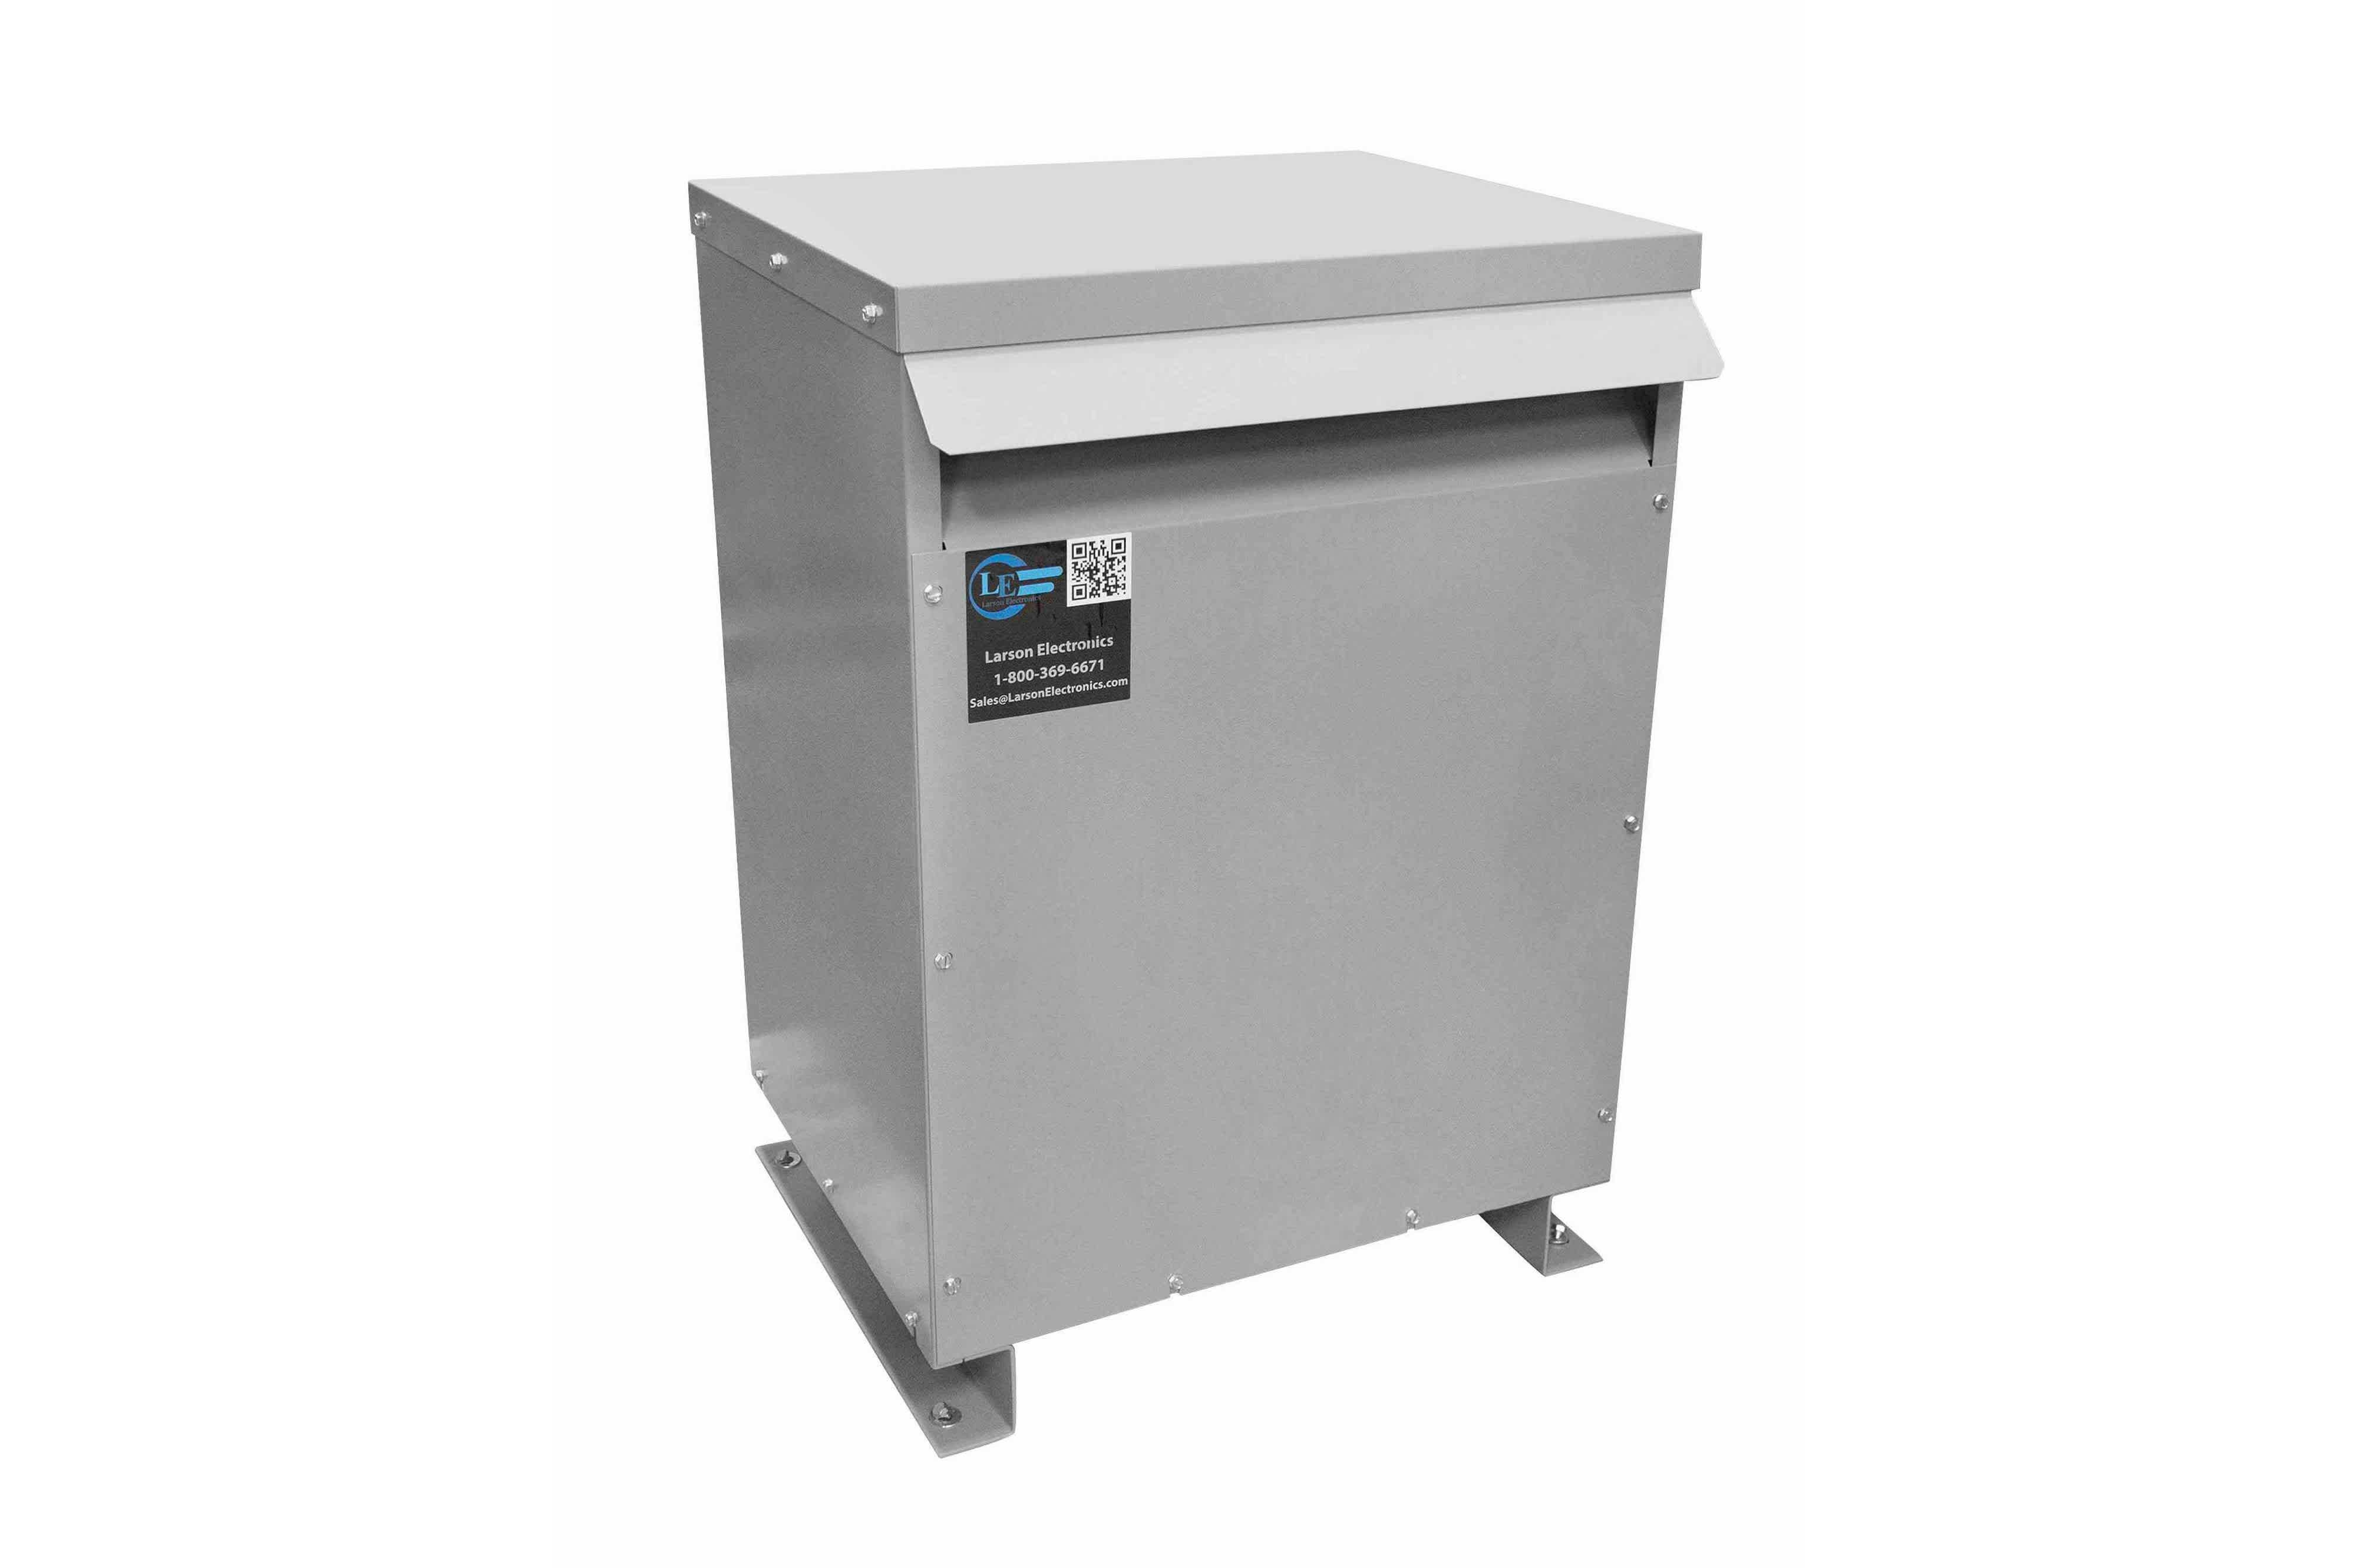 300 kVA 3PH Isolation Transformer, 220V Wye Primary, 208Y/120 Wye-N Secondary, N3R, Ventilated, 60 Hz